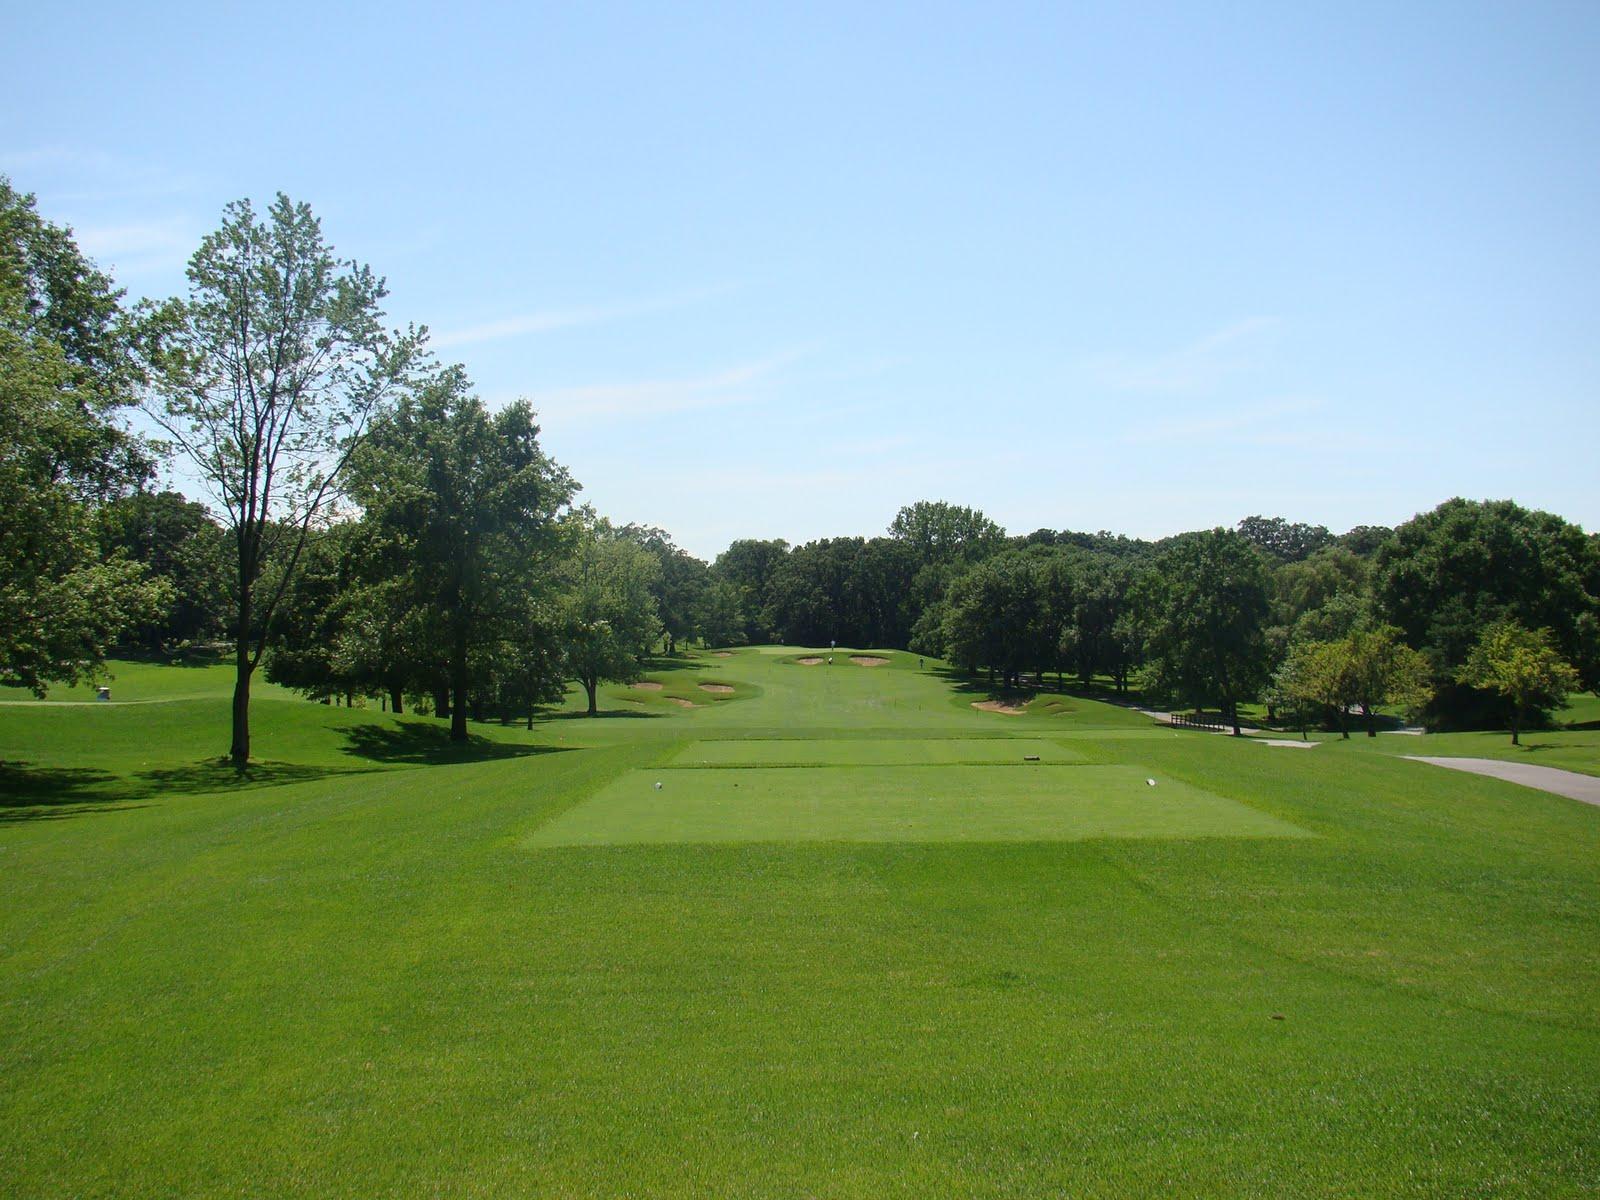 golf pic of the week cog hill course no 4 par 4 4th. Black Bedroom Furniture Sets. Home Design Ideas